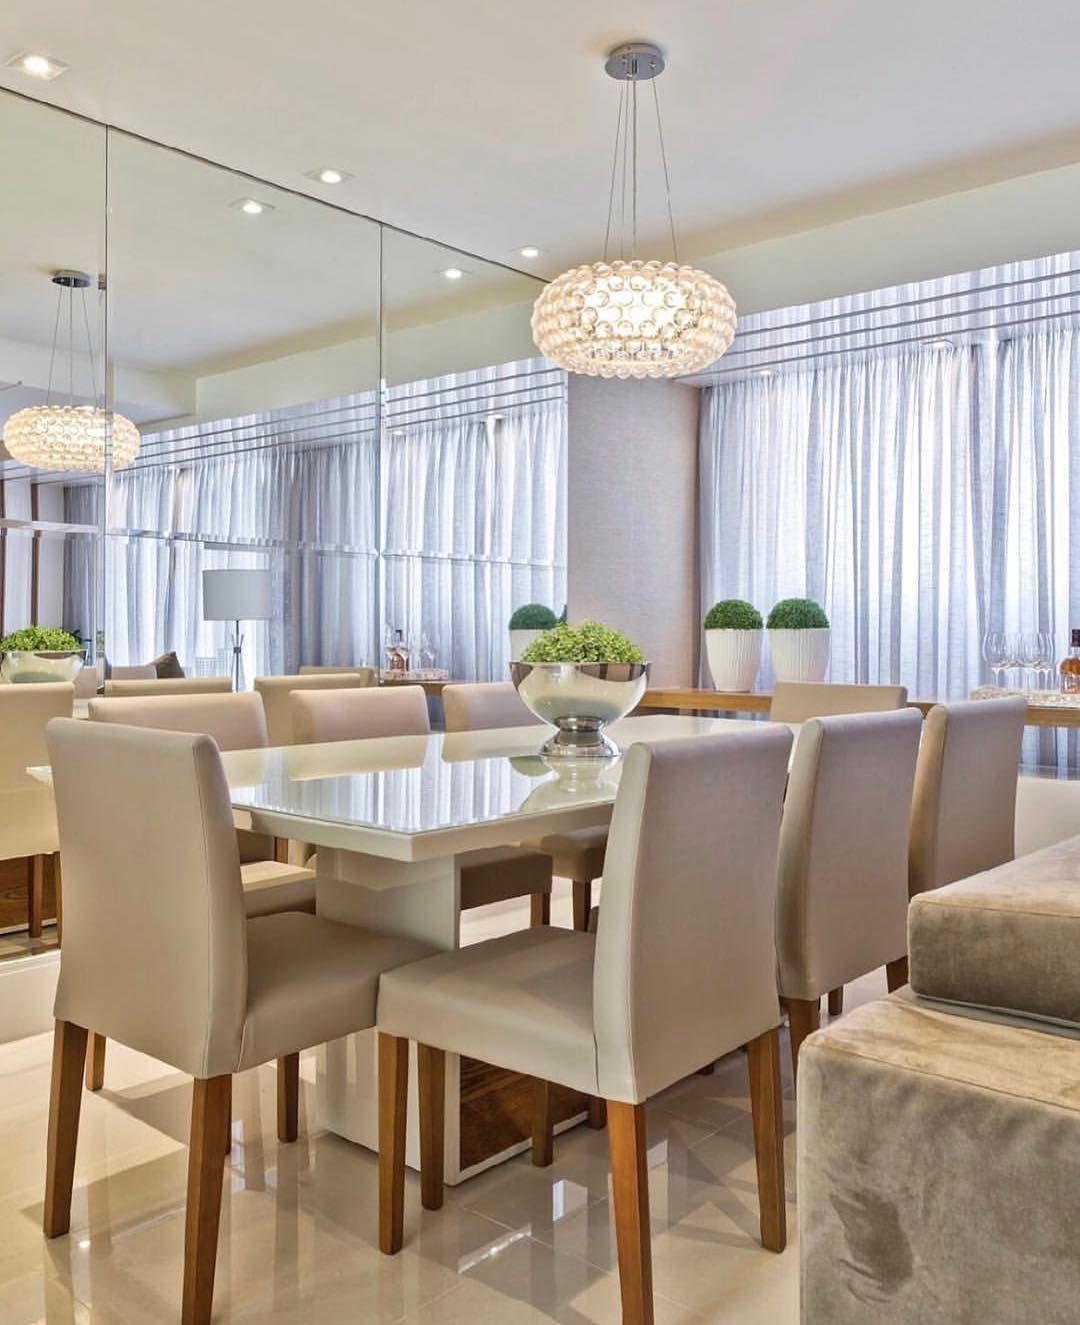 Lustre Sala De Jantar Diferente Estar Jantar Pinterest Lustre  -> Lustres Para Sala De Apartamento Pequeno